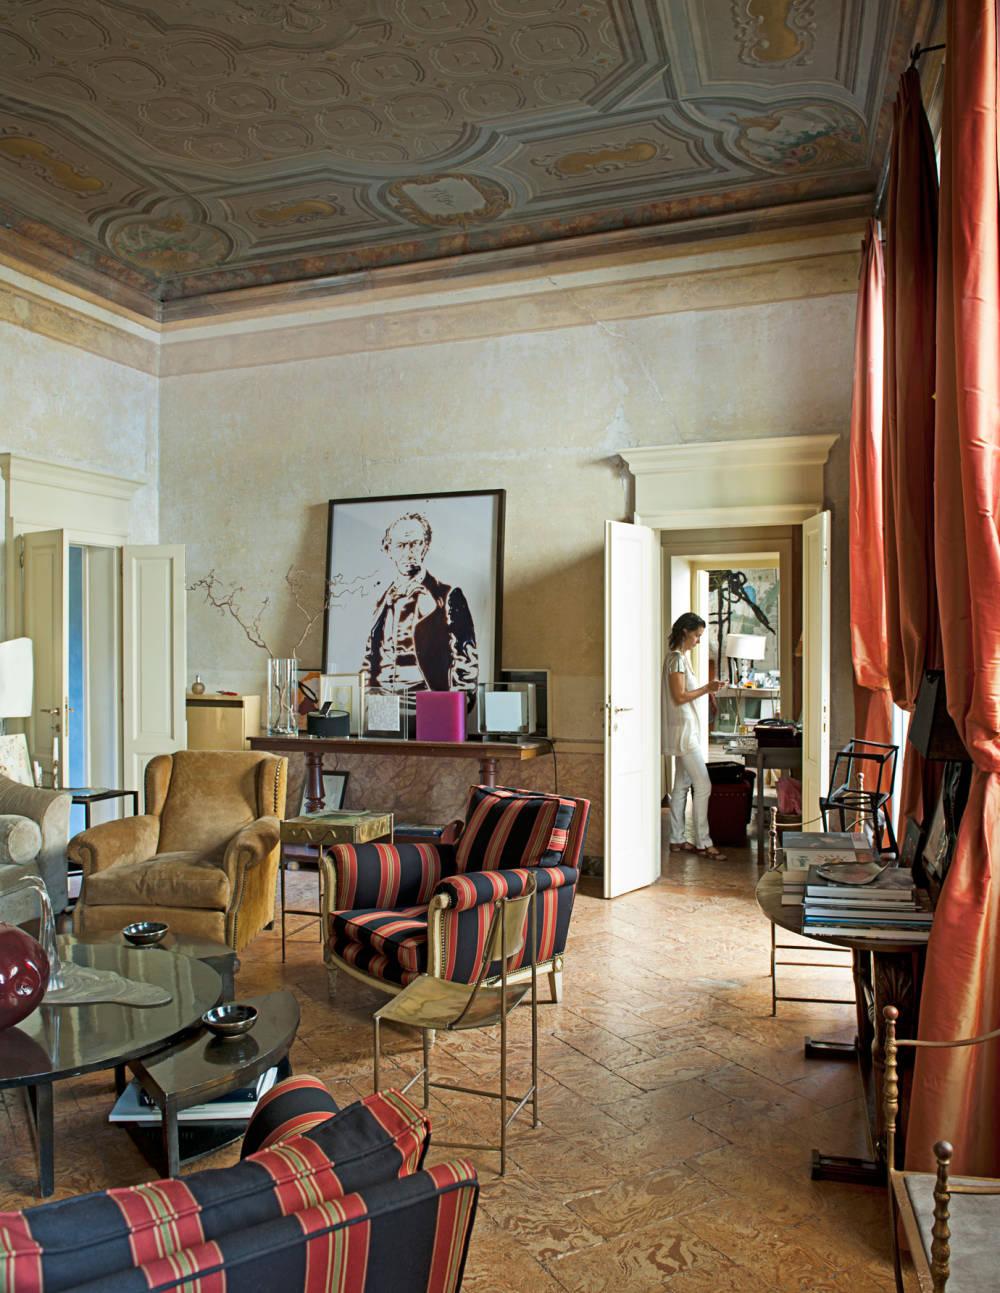 TCX-02-italian-pallazo-living-room-vik-muniz-portraits-1111-xl-mv